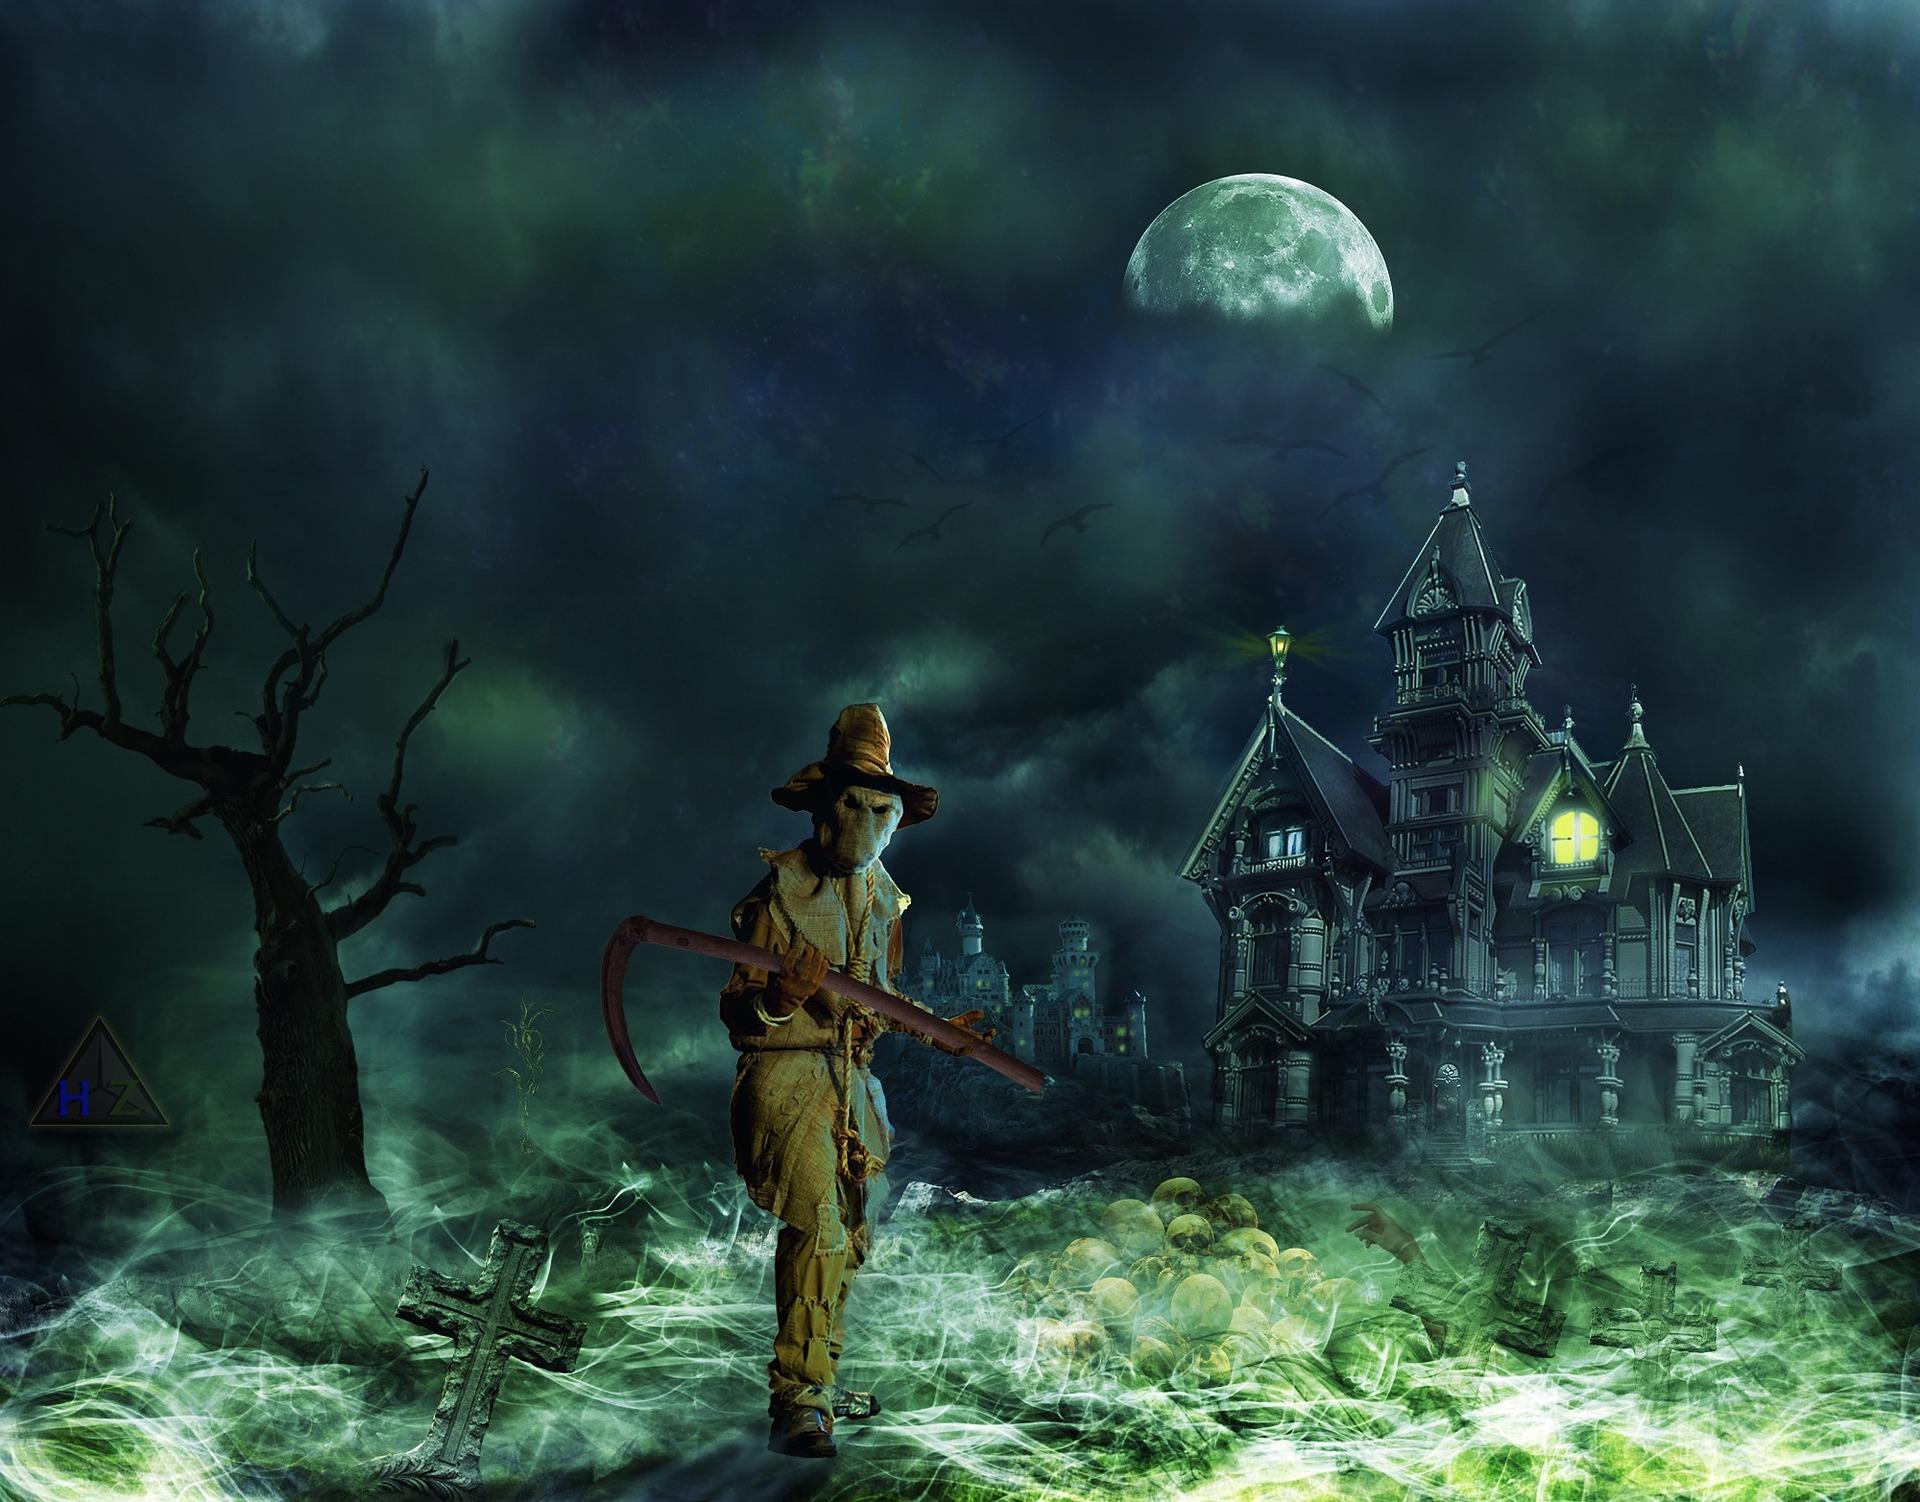 grim reaper haunted house